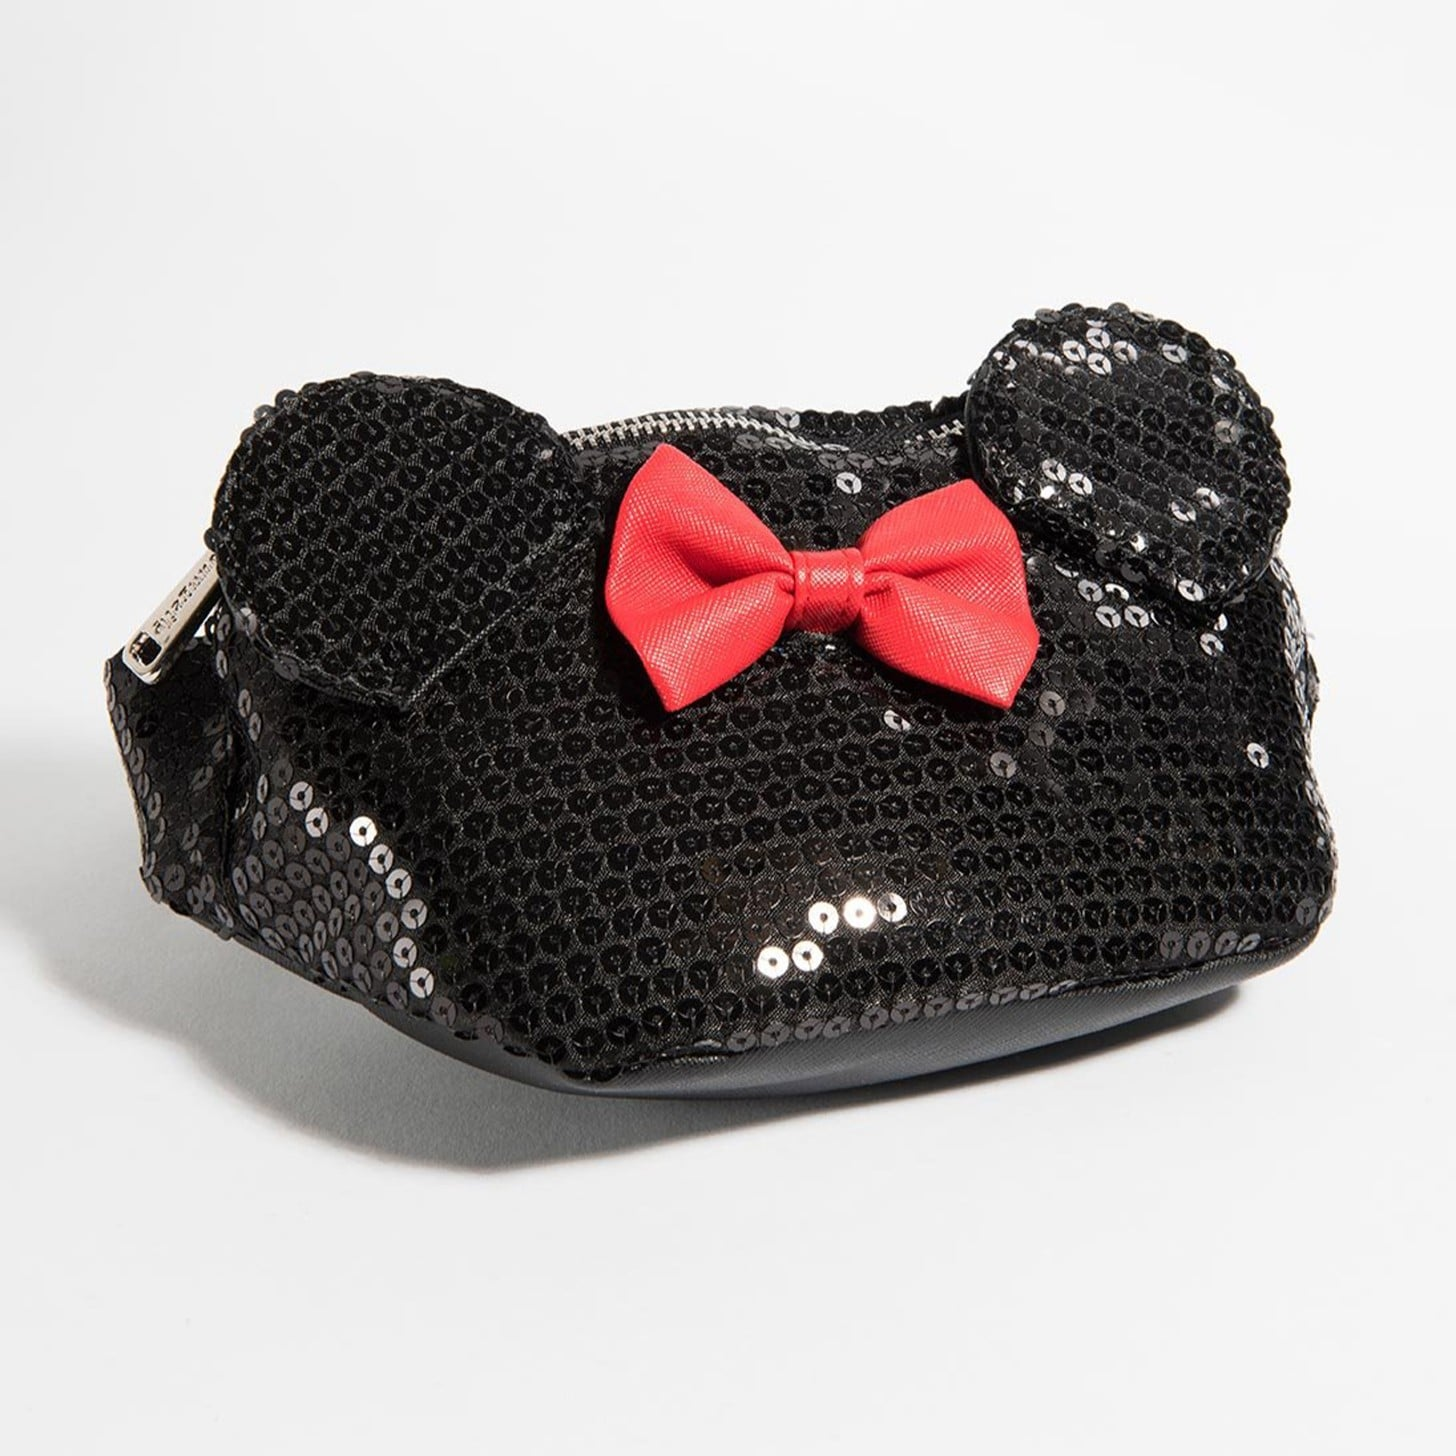 brand new 036bb 02835 Typo x Disney Mickey Ears Cap   Cheap Disney Gifts For Adults   POPSUGAR  Smart Living Photo 35